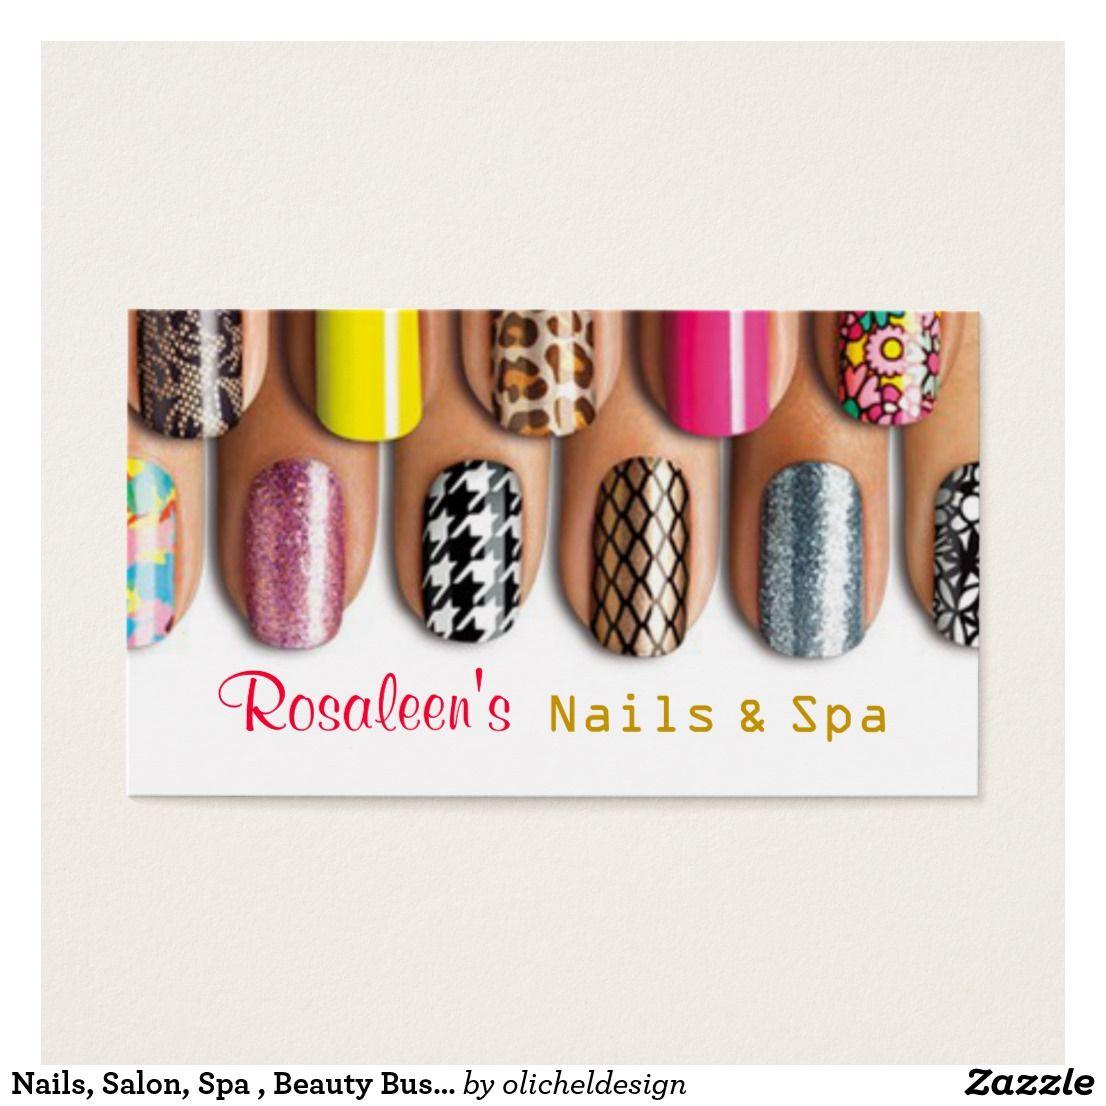 Nails salon spa beauty business card beauty business cards nails salon spa beauty business card reheart Gallery